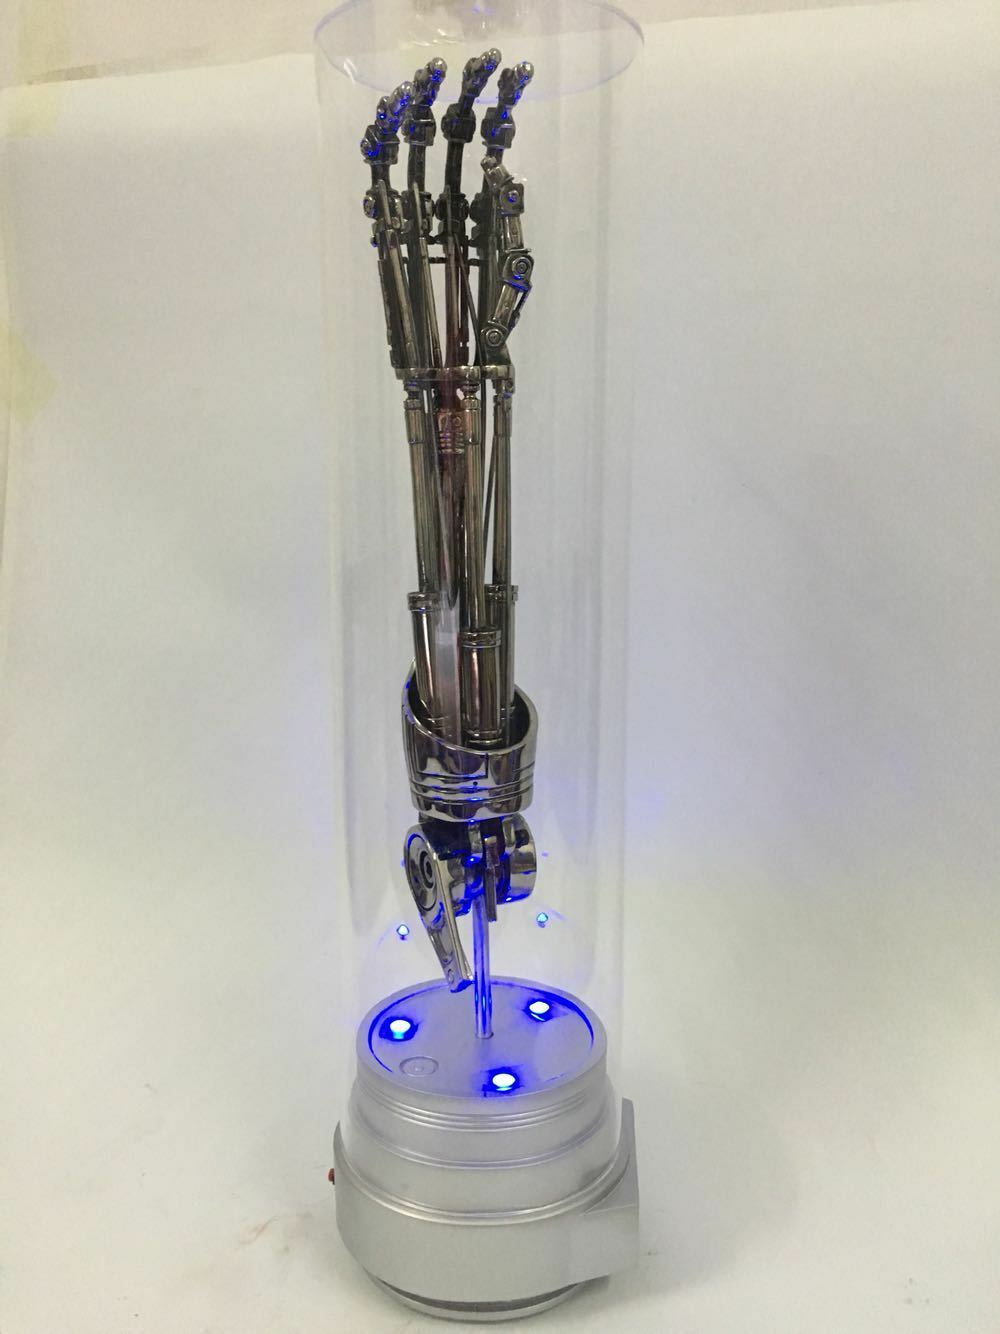 Terminator 2 T800 Endo Arm 1 1  Life-Size Figure Statue Model Toy Prop Replica